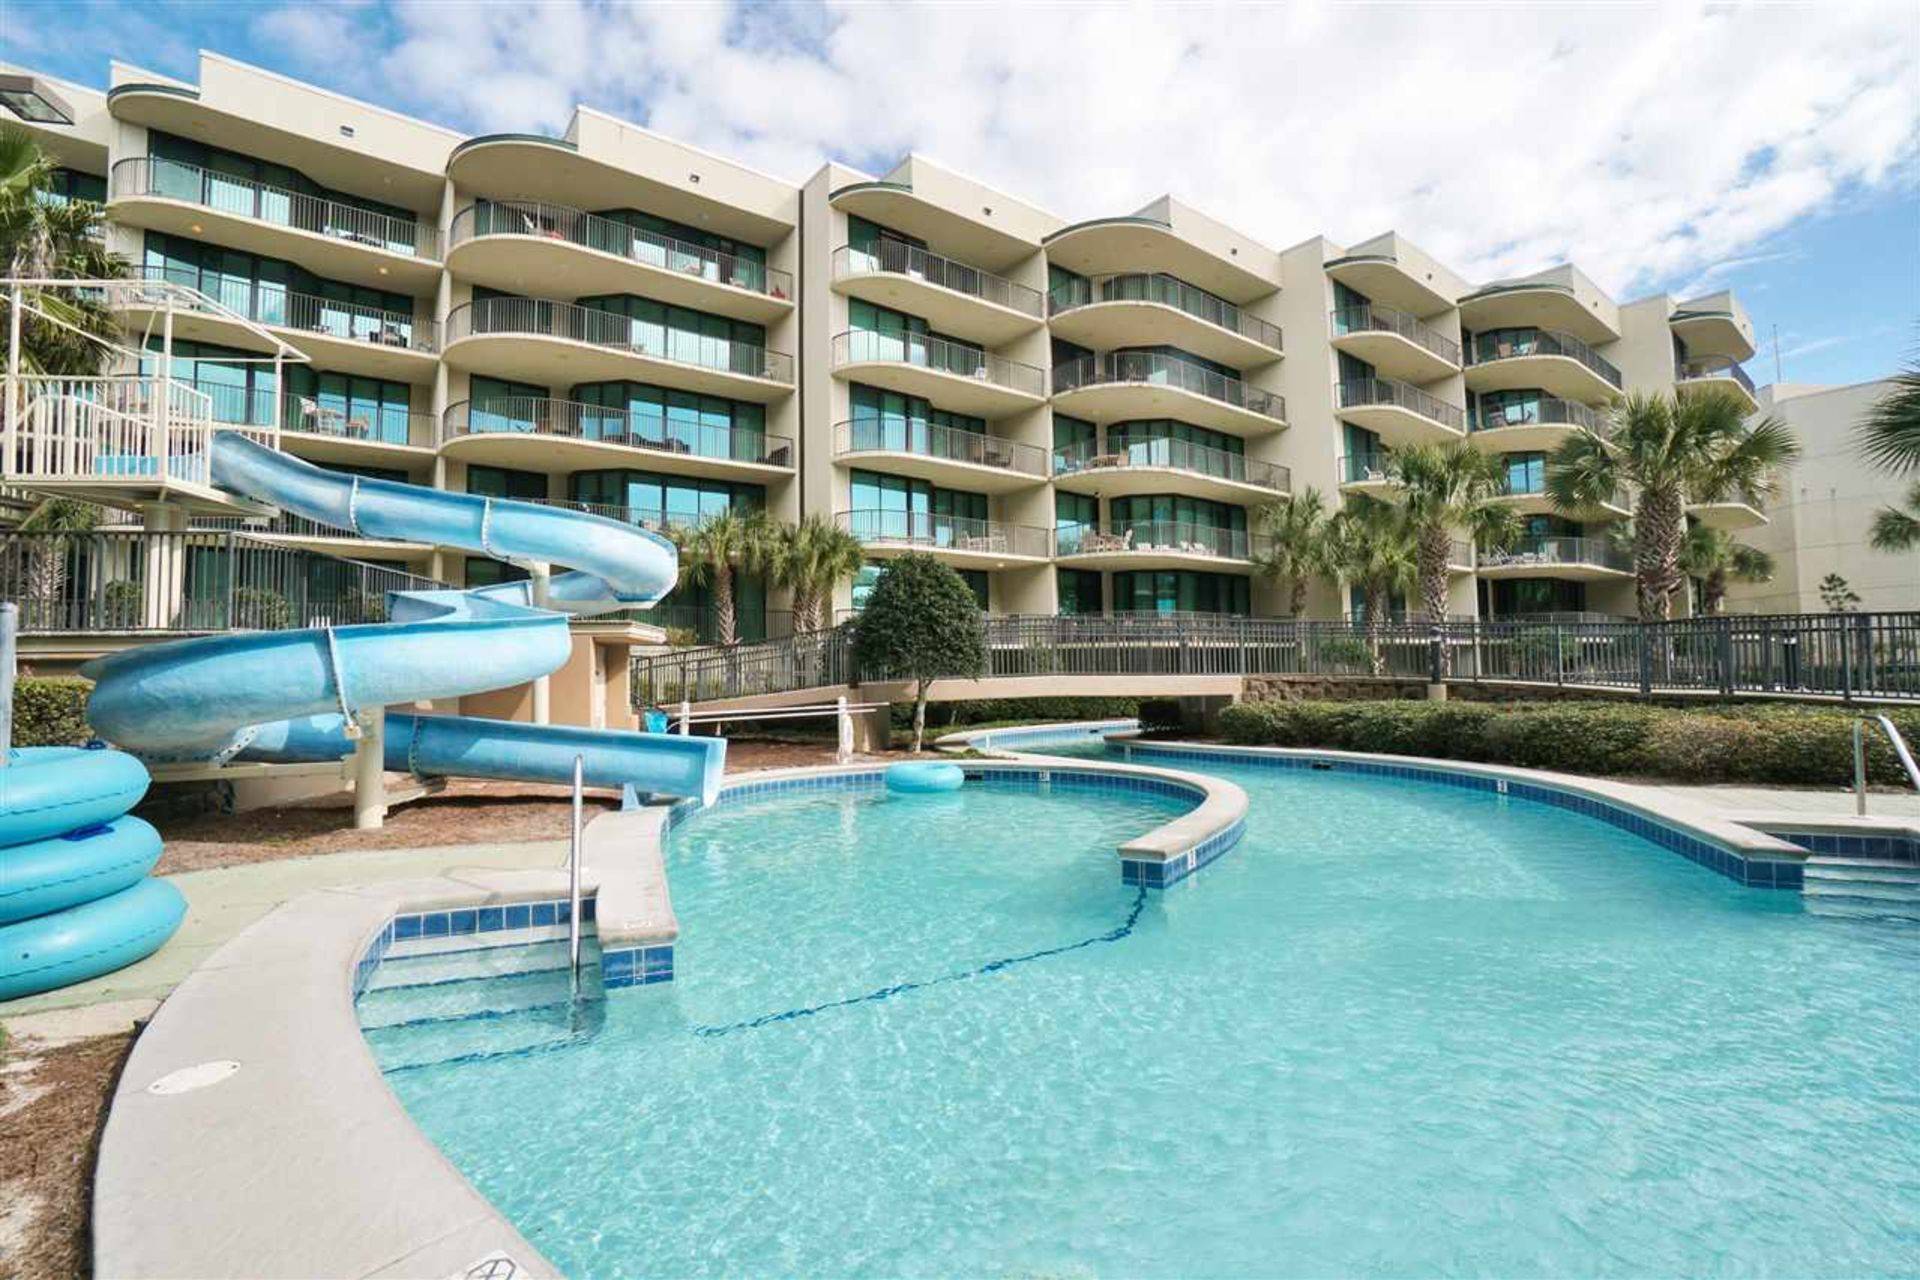 Orange Beach Condos from $500,000 to $600,000